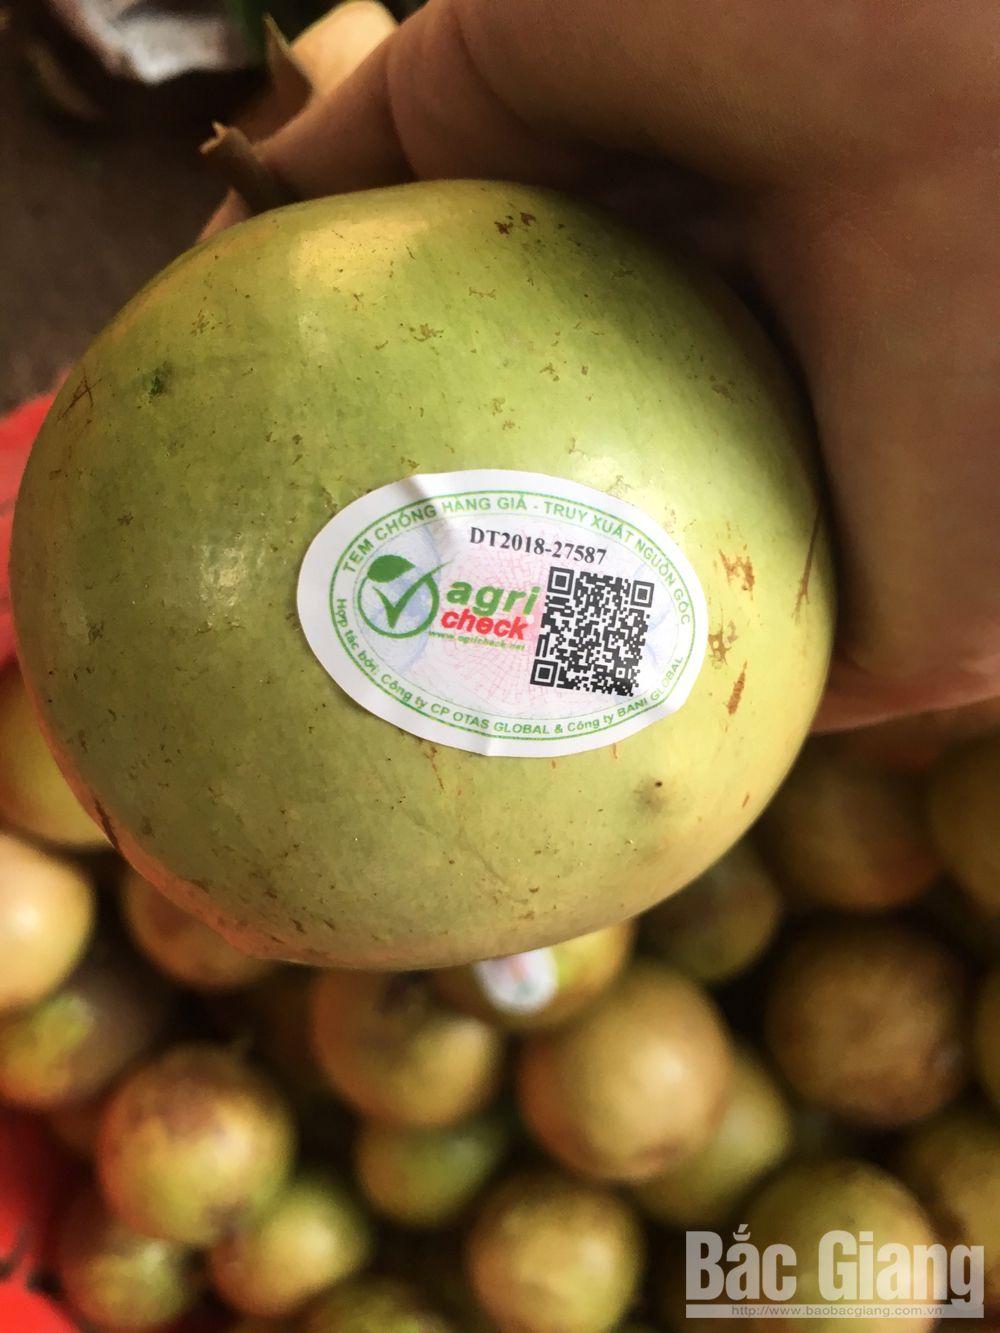 Tan Yen district,  Bac Giang province, farm produce, origin traceability,  brand protection,  consumption market,